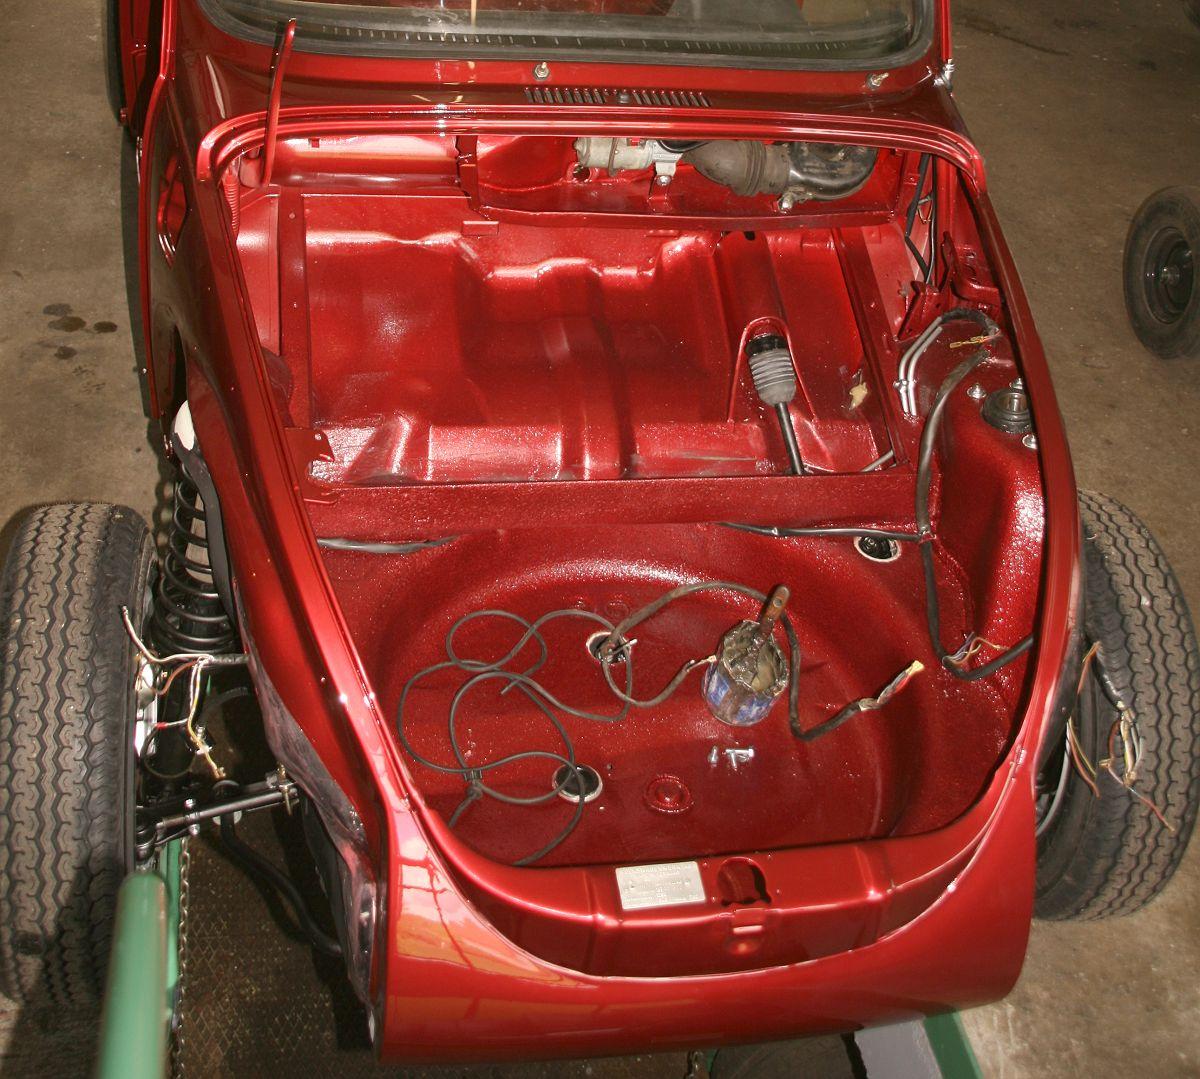 Vw K 228 Fer 1303 Cabrio Baujahr 1972 Holucar